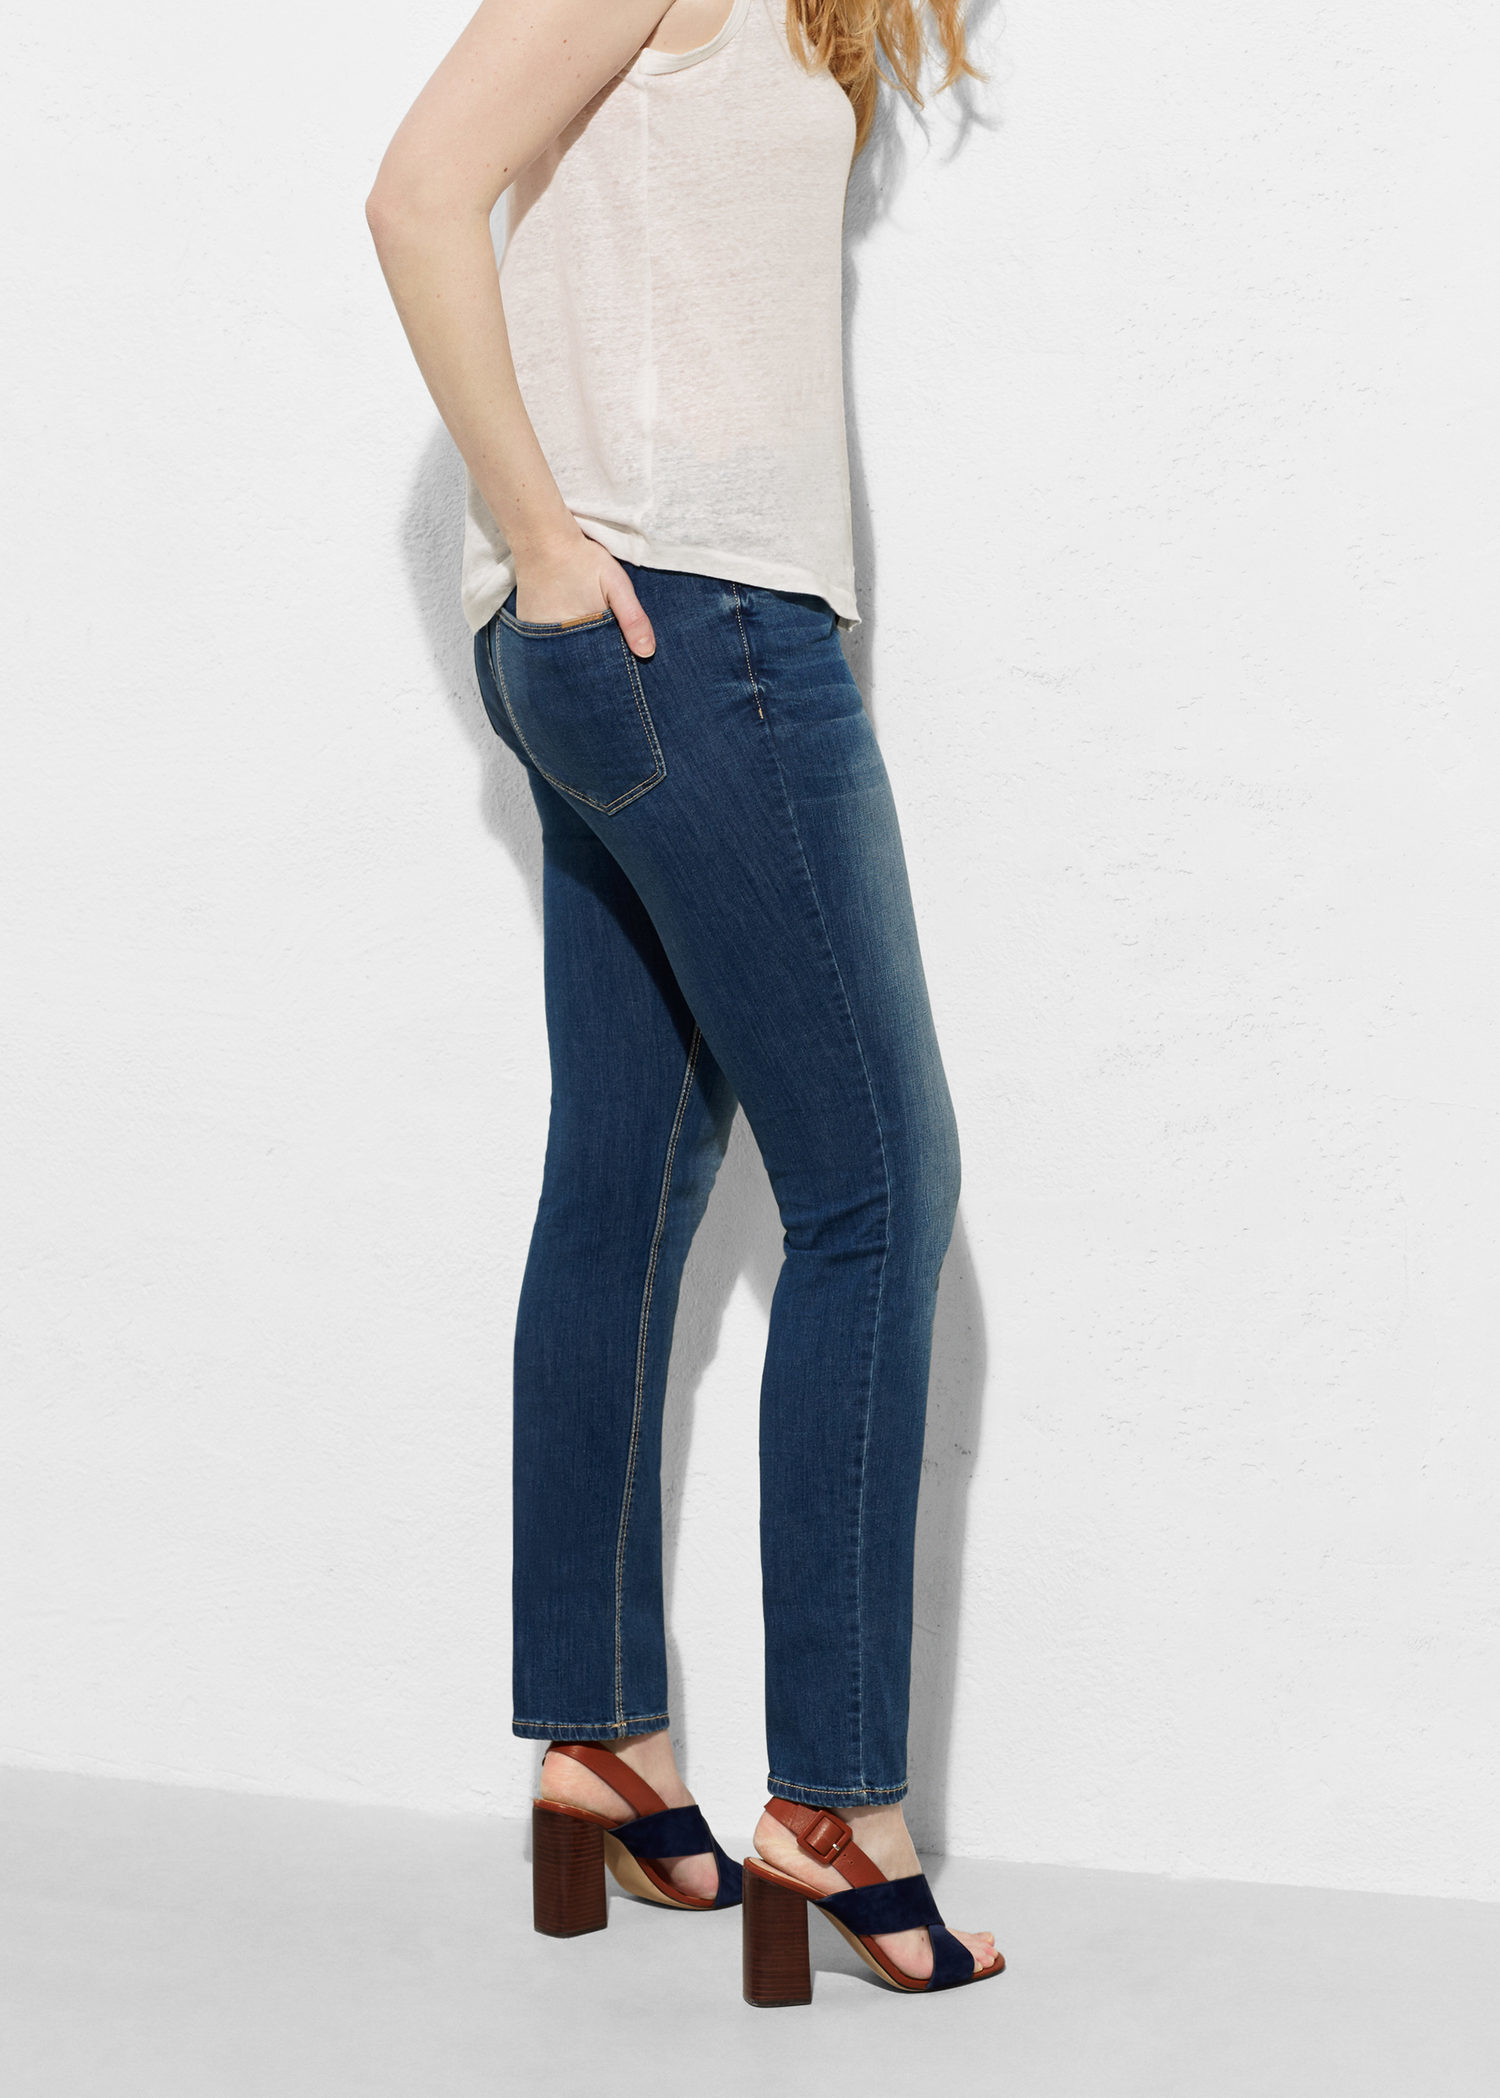 496aa6738ed6 Violeta by Mango Slim-fit Susan Jeans in Blue - Lyst